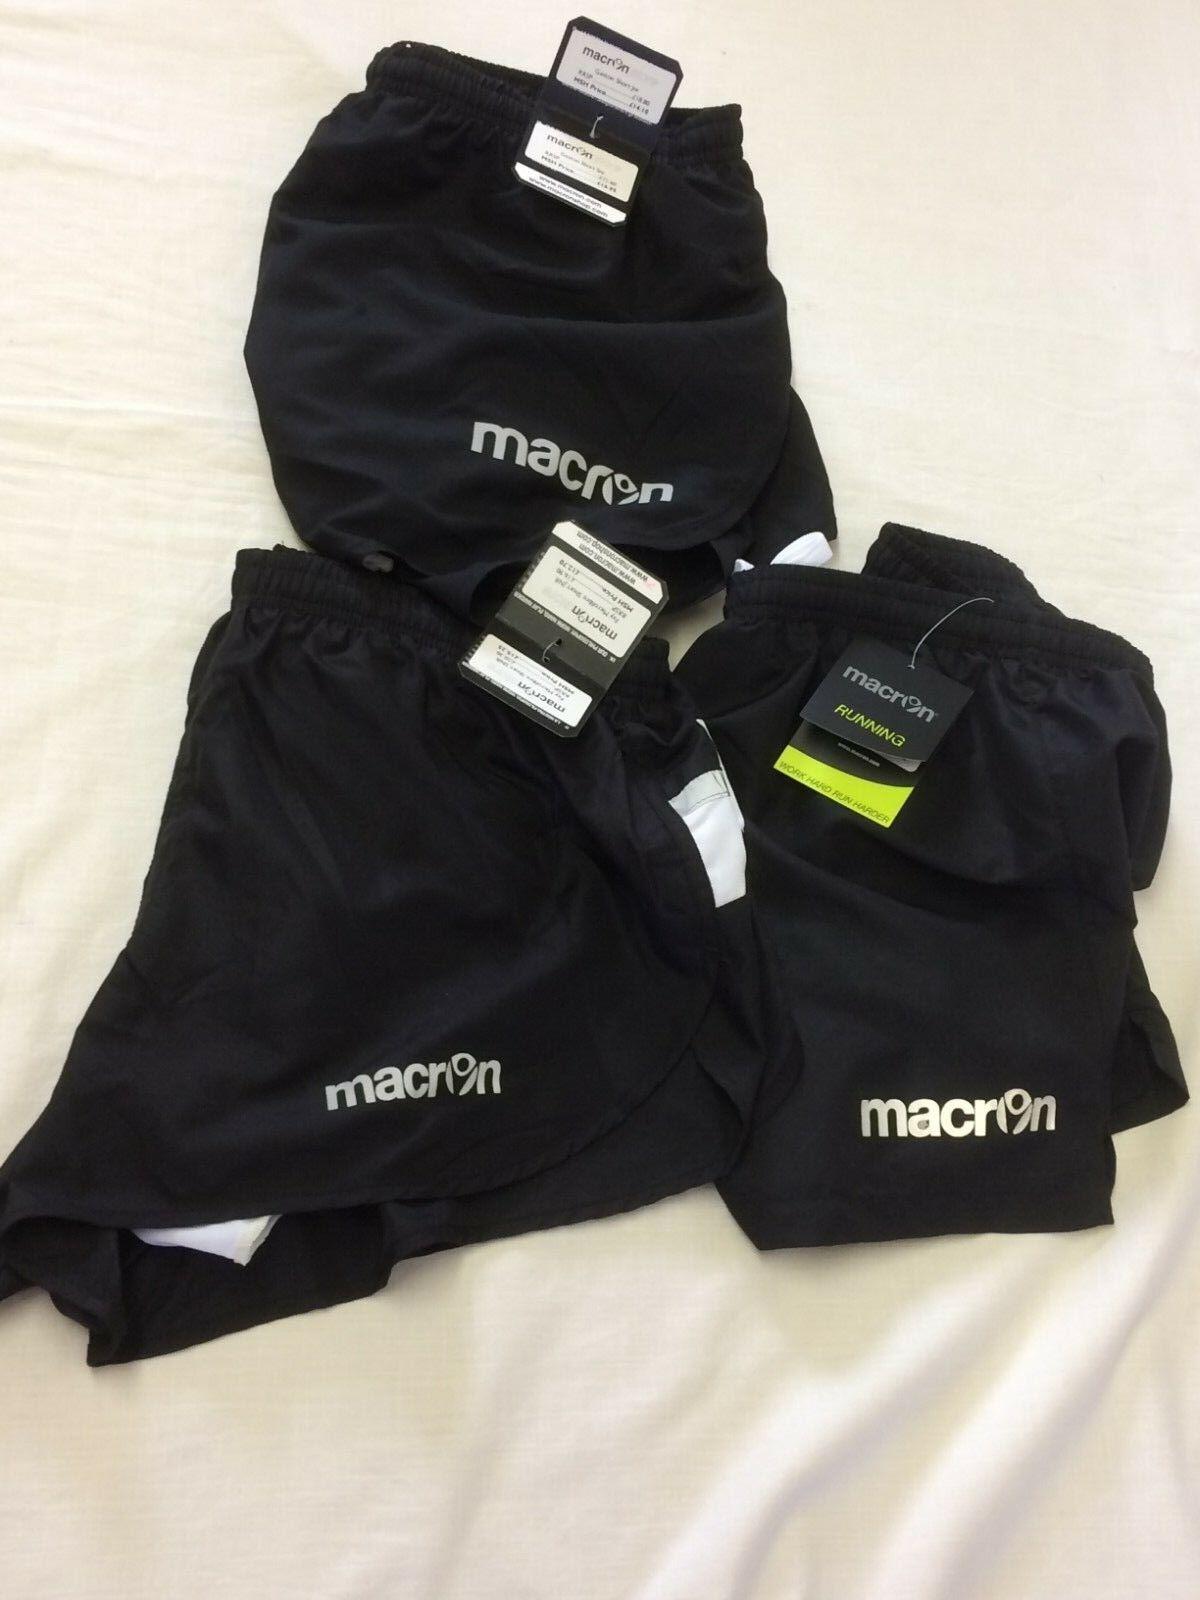 3 X MACRON RUNNING SHORTS MEDIUM- DIFFERENT STYLES